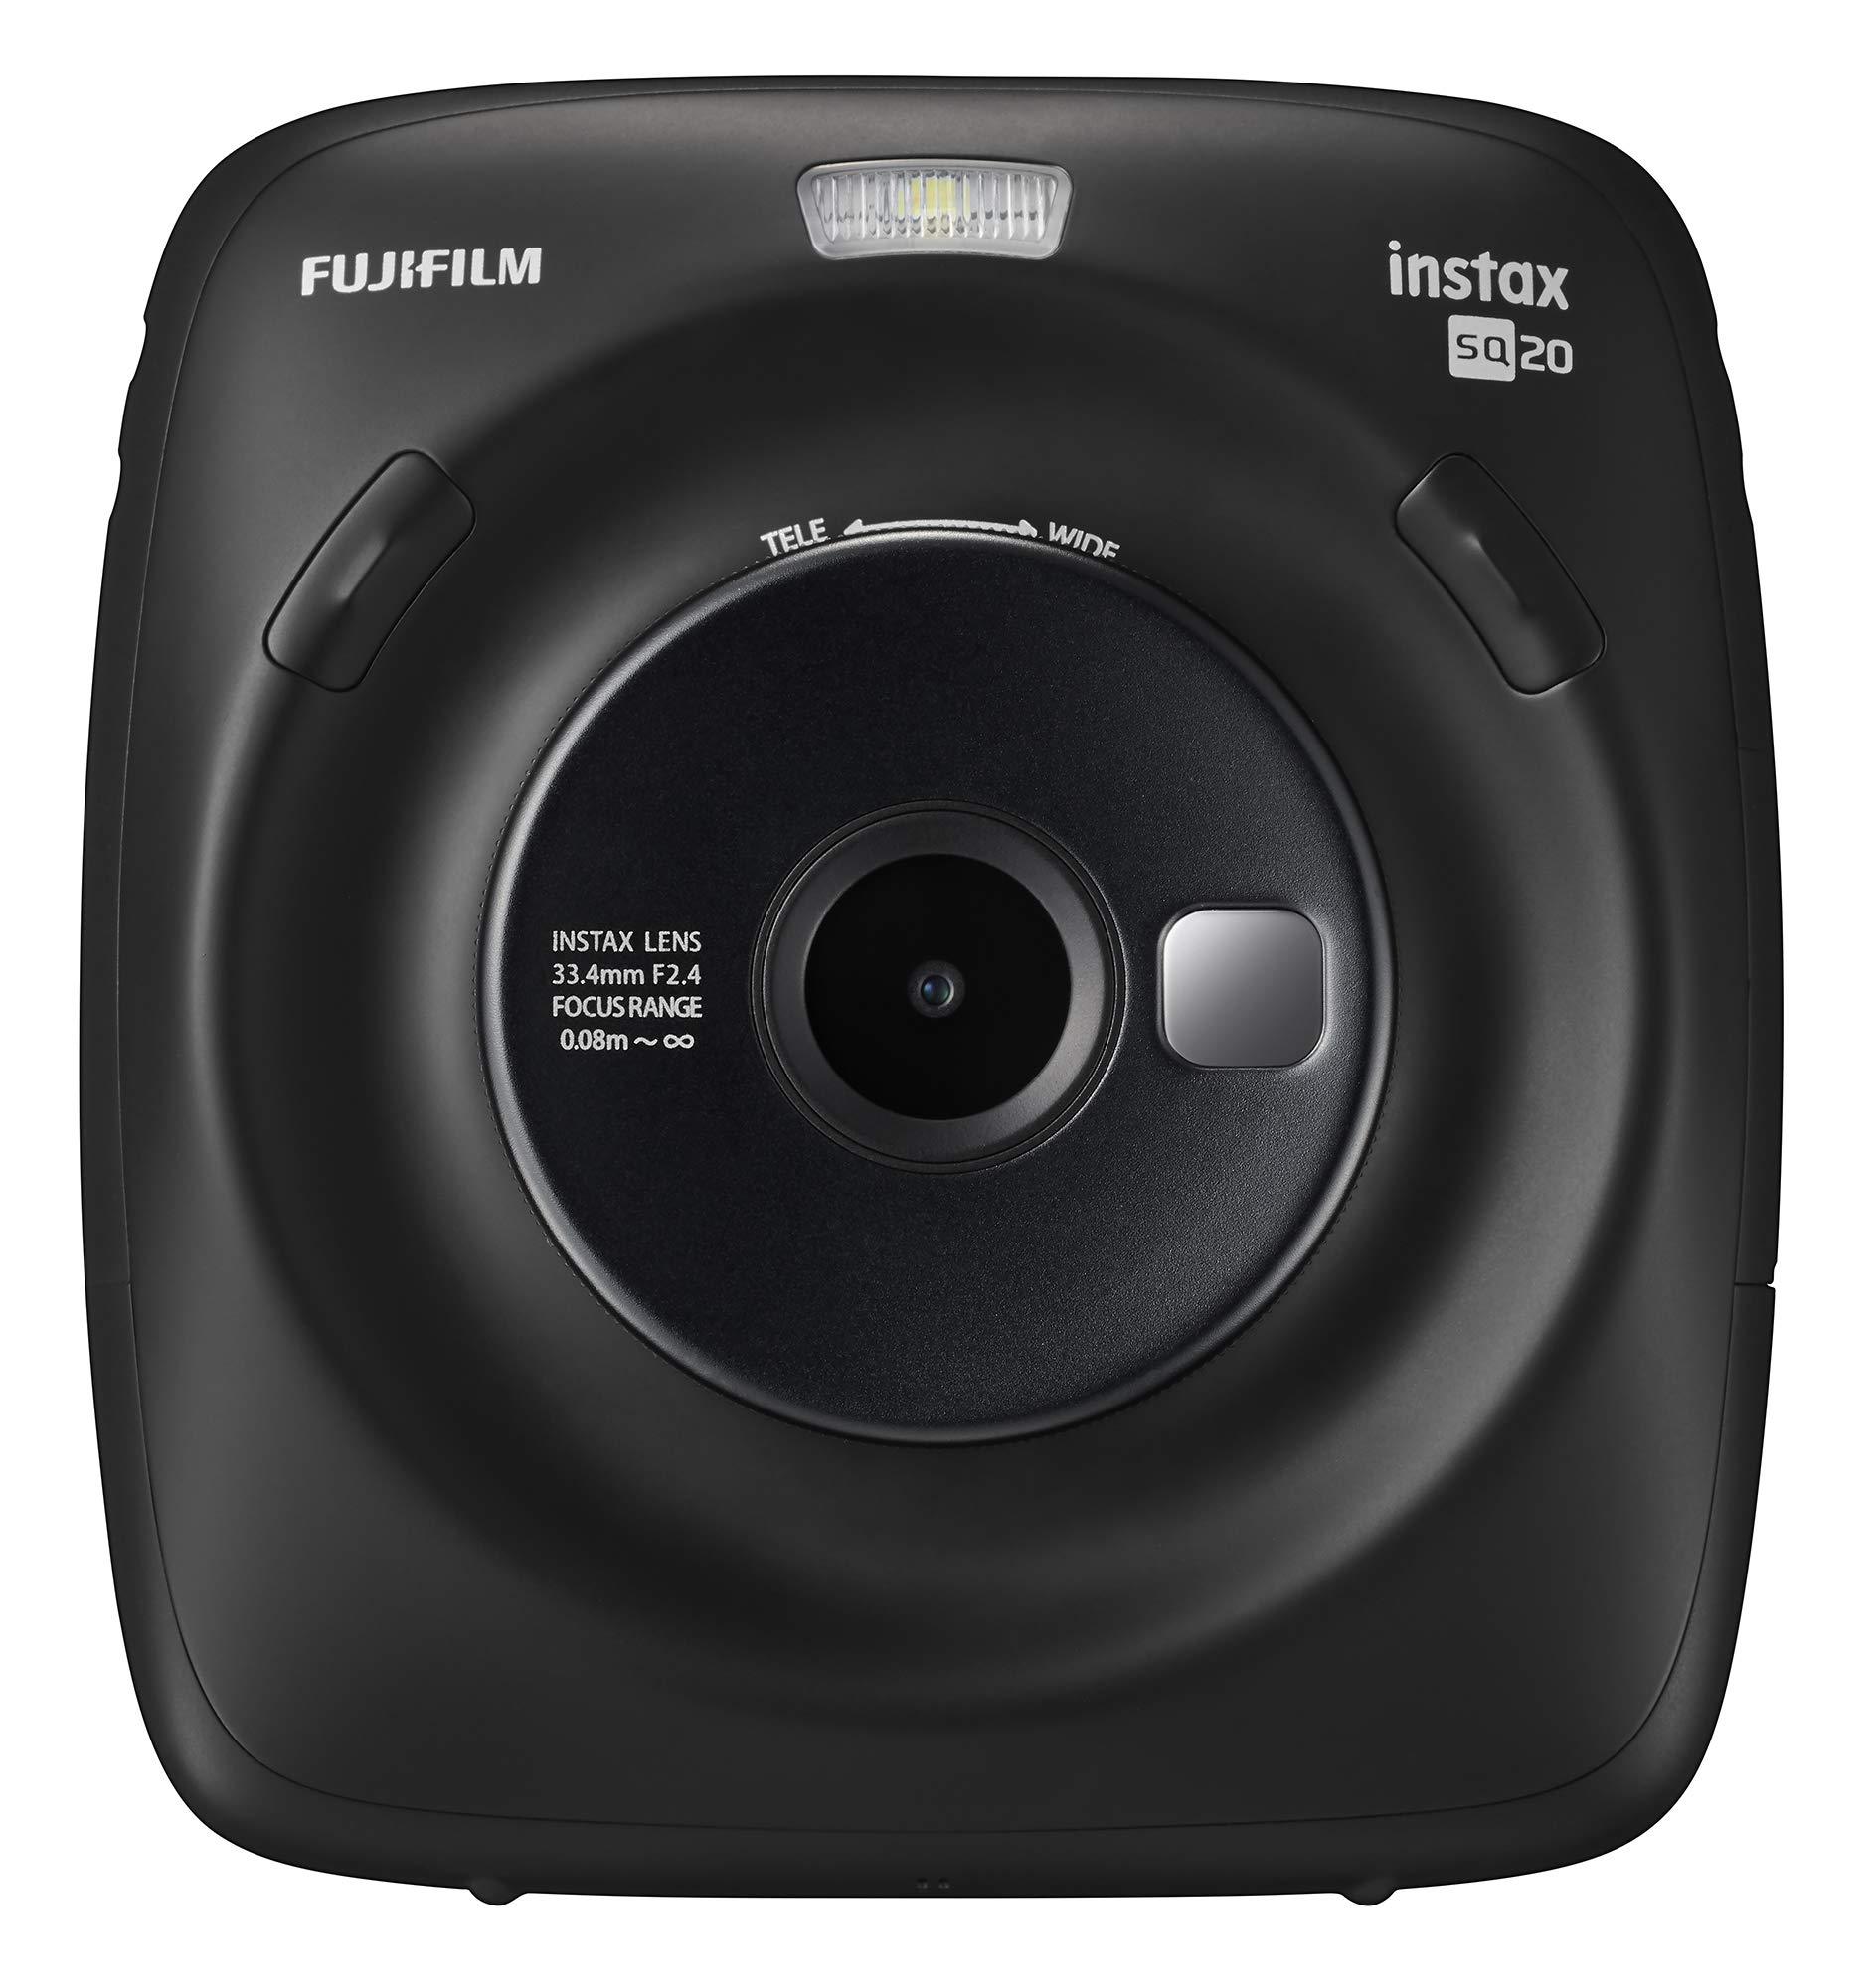 Fujifilm Instax Square SQ20 Instant Film Camera - Black by Fujifilm